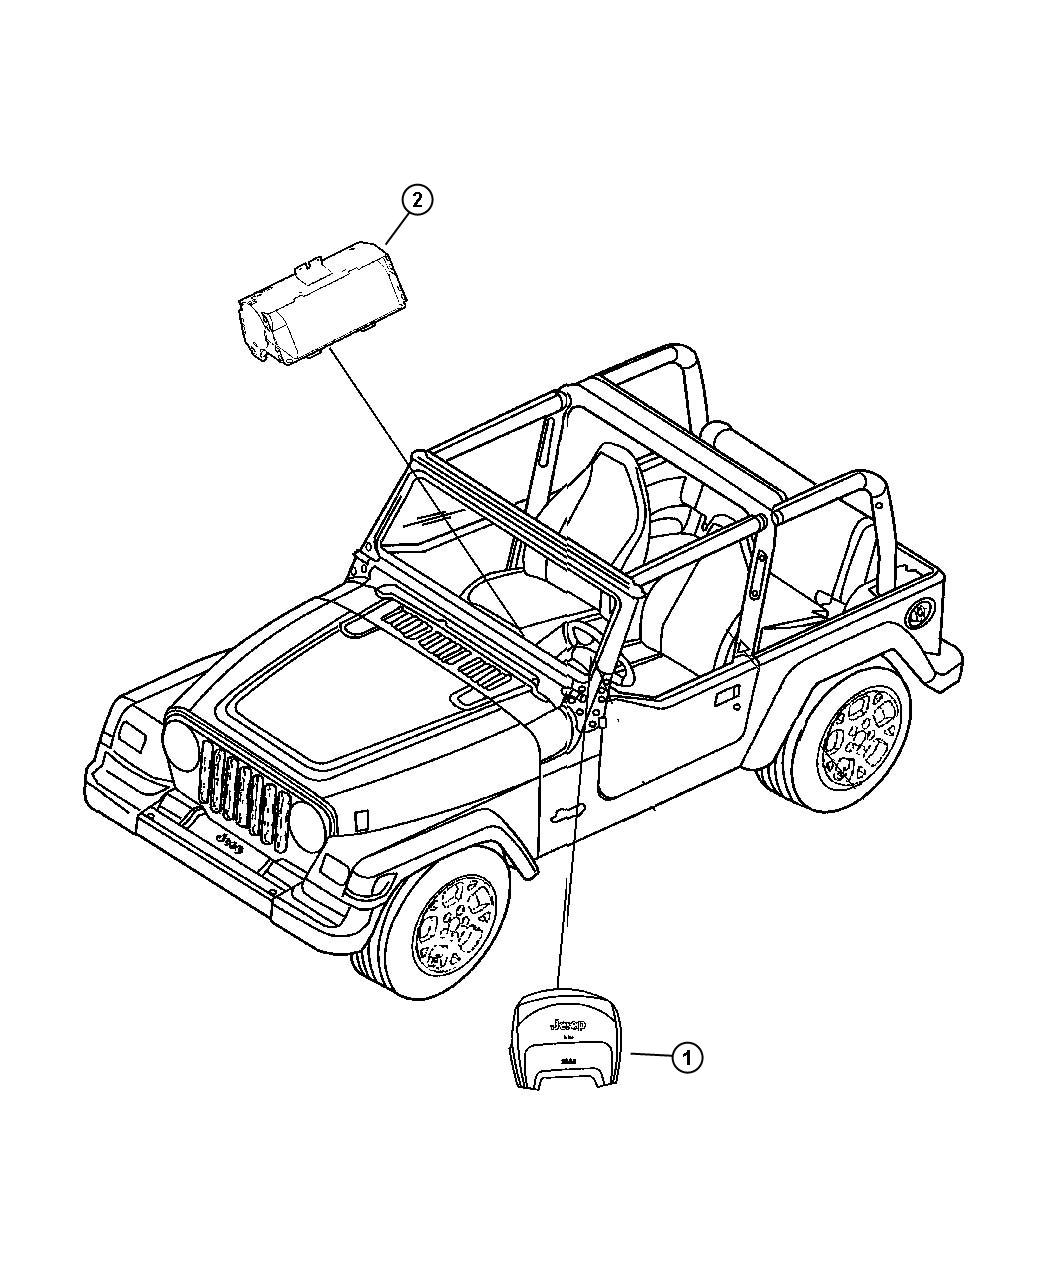 2017 Jeep Wrangler Air bag. Export. Passenger